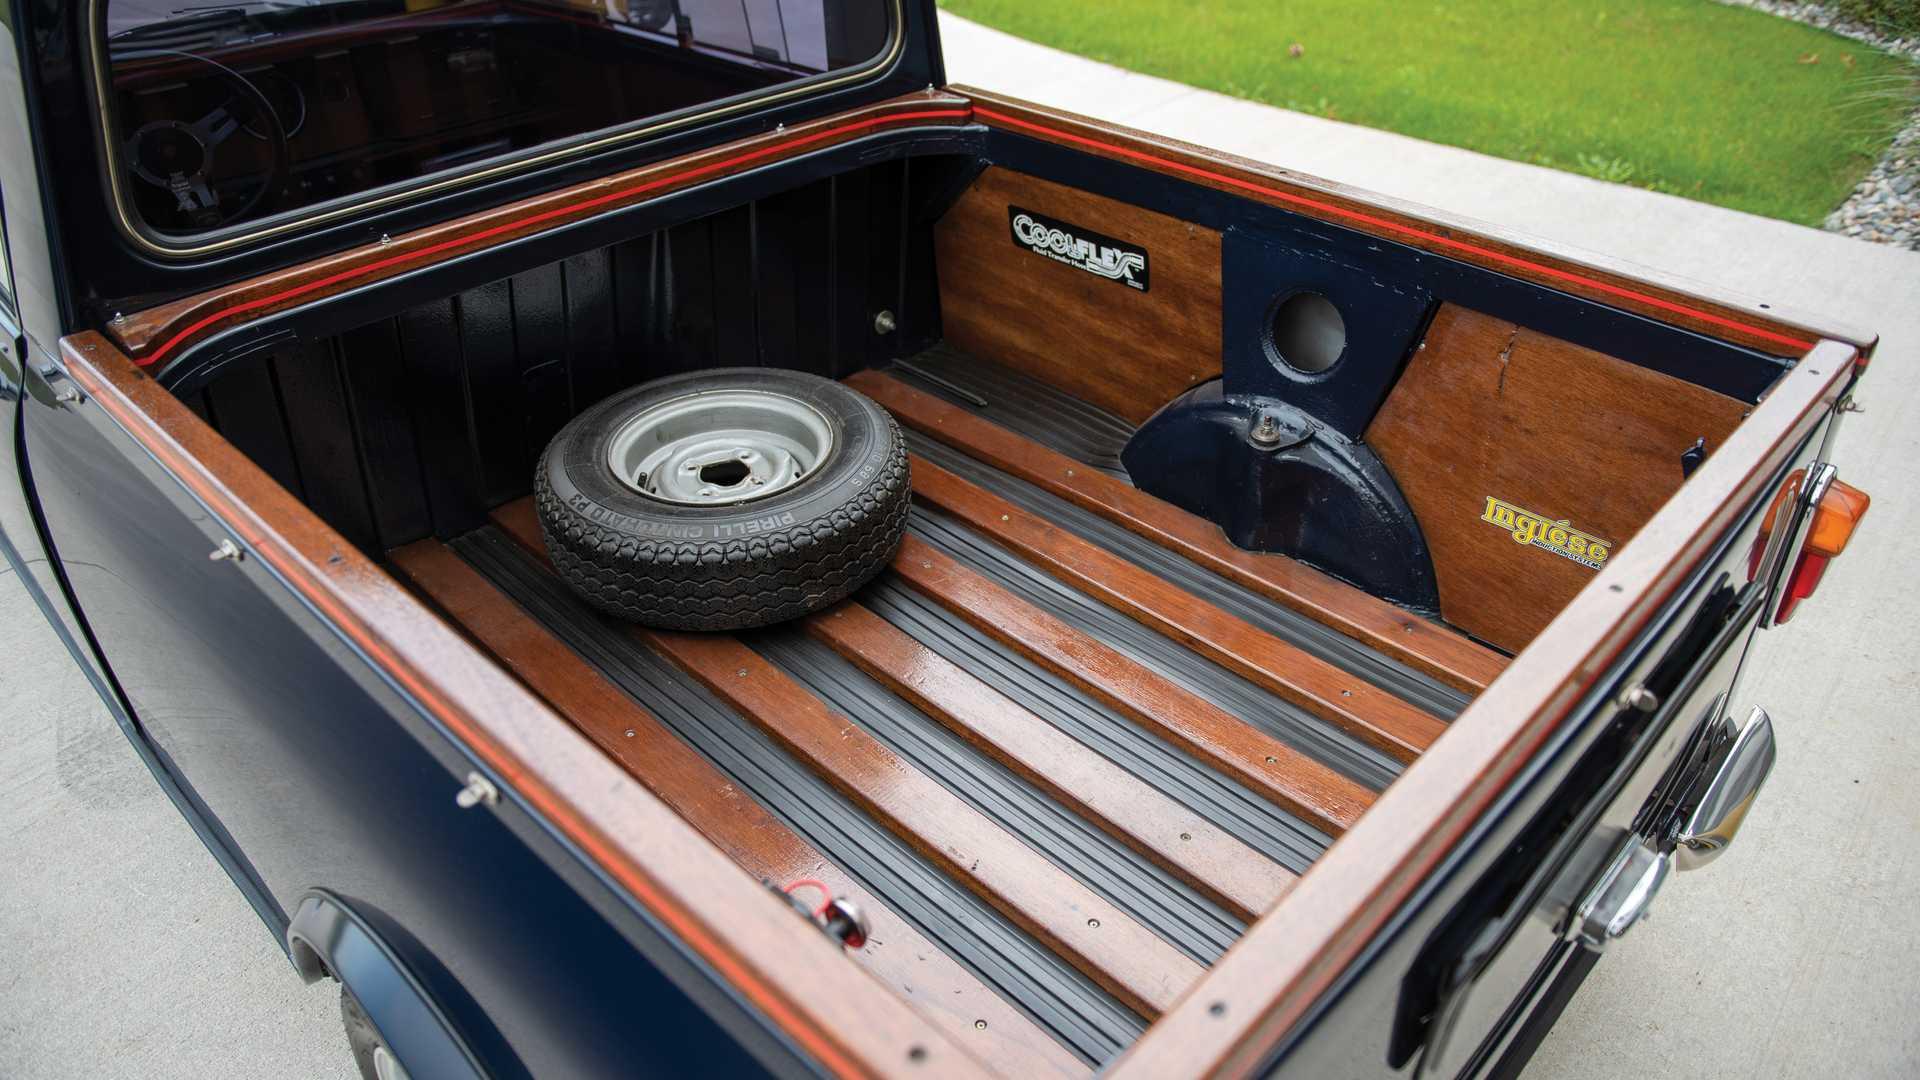 Austin Mini Pickup или самый симпатичный маленький грузовик